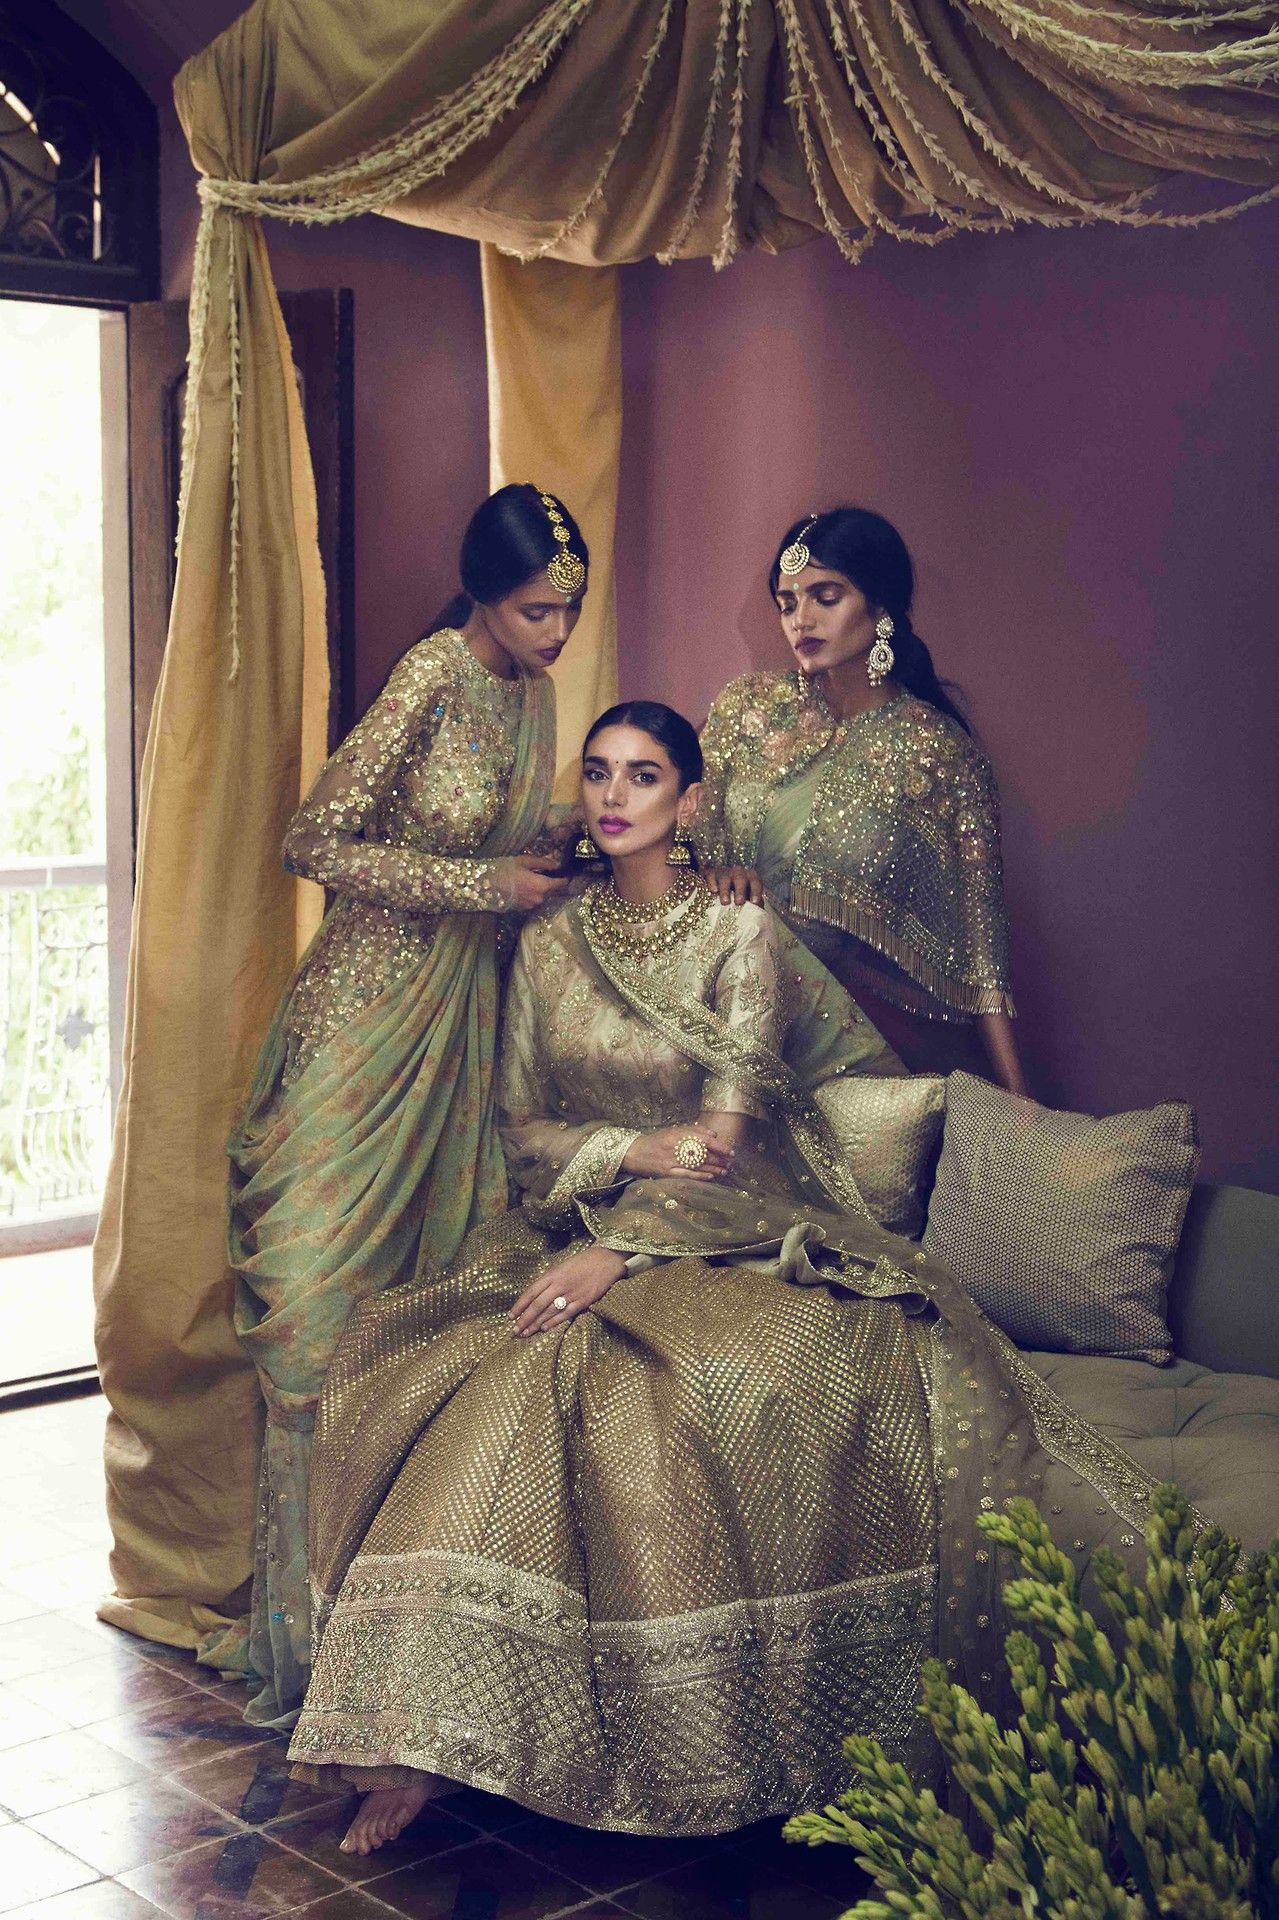 South asian wedding dresses  Pin by Sanya Tanwir on Wedding Dresses PakistaniIndian  Pinterest